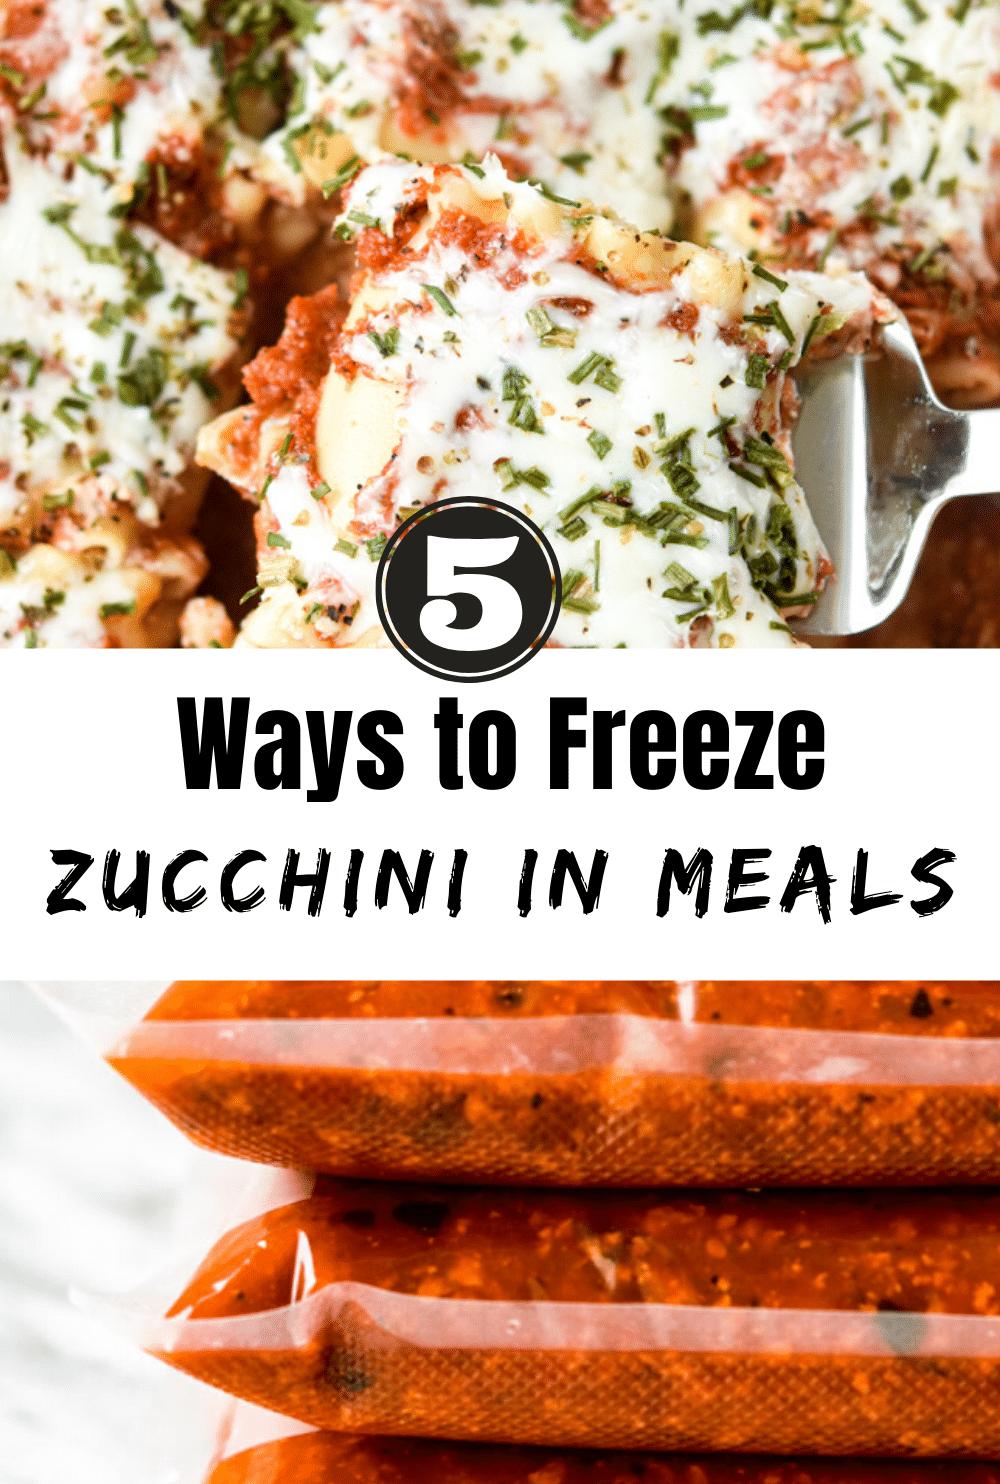 5 Ways to Freeze Zucchini in Meals